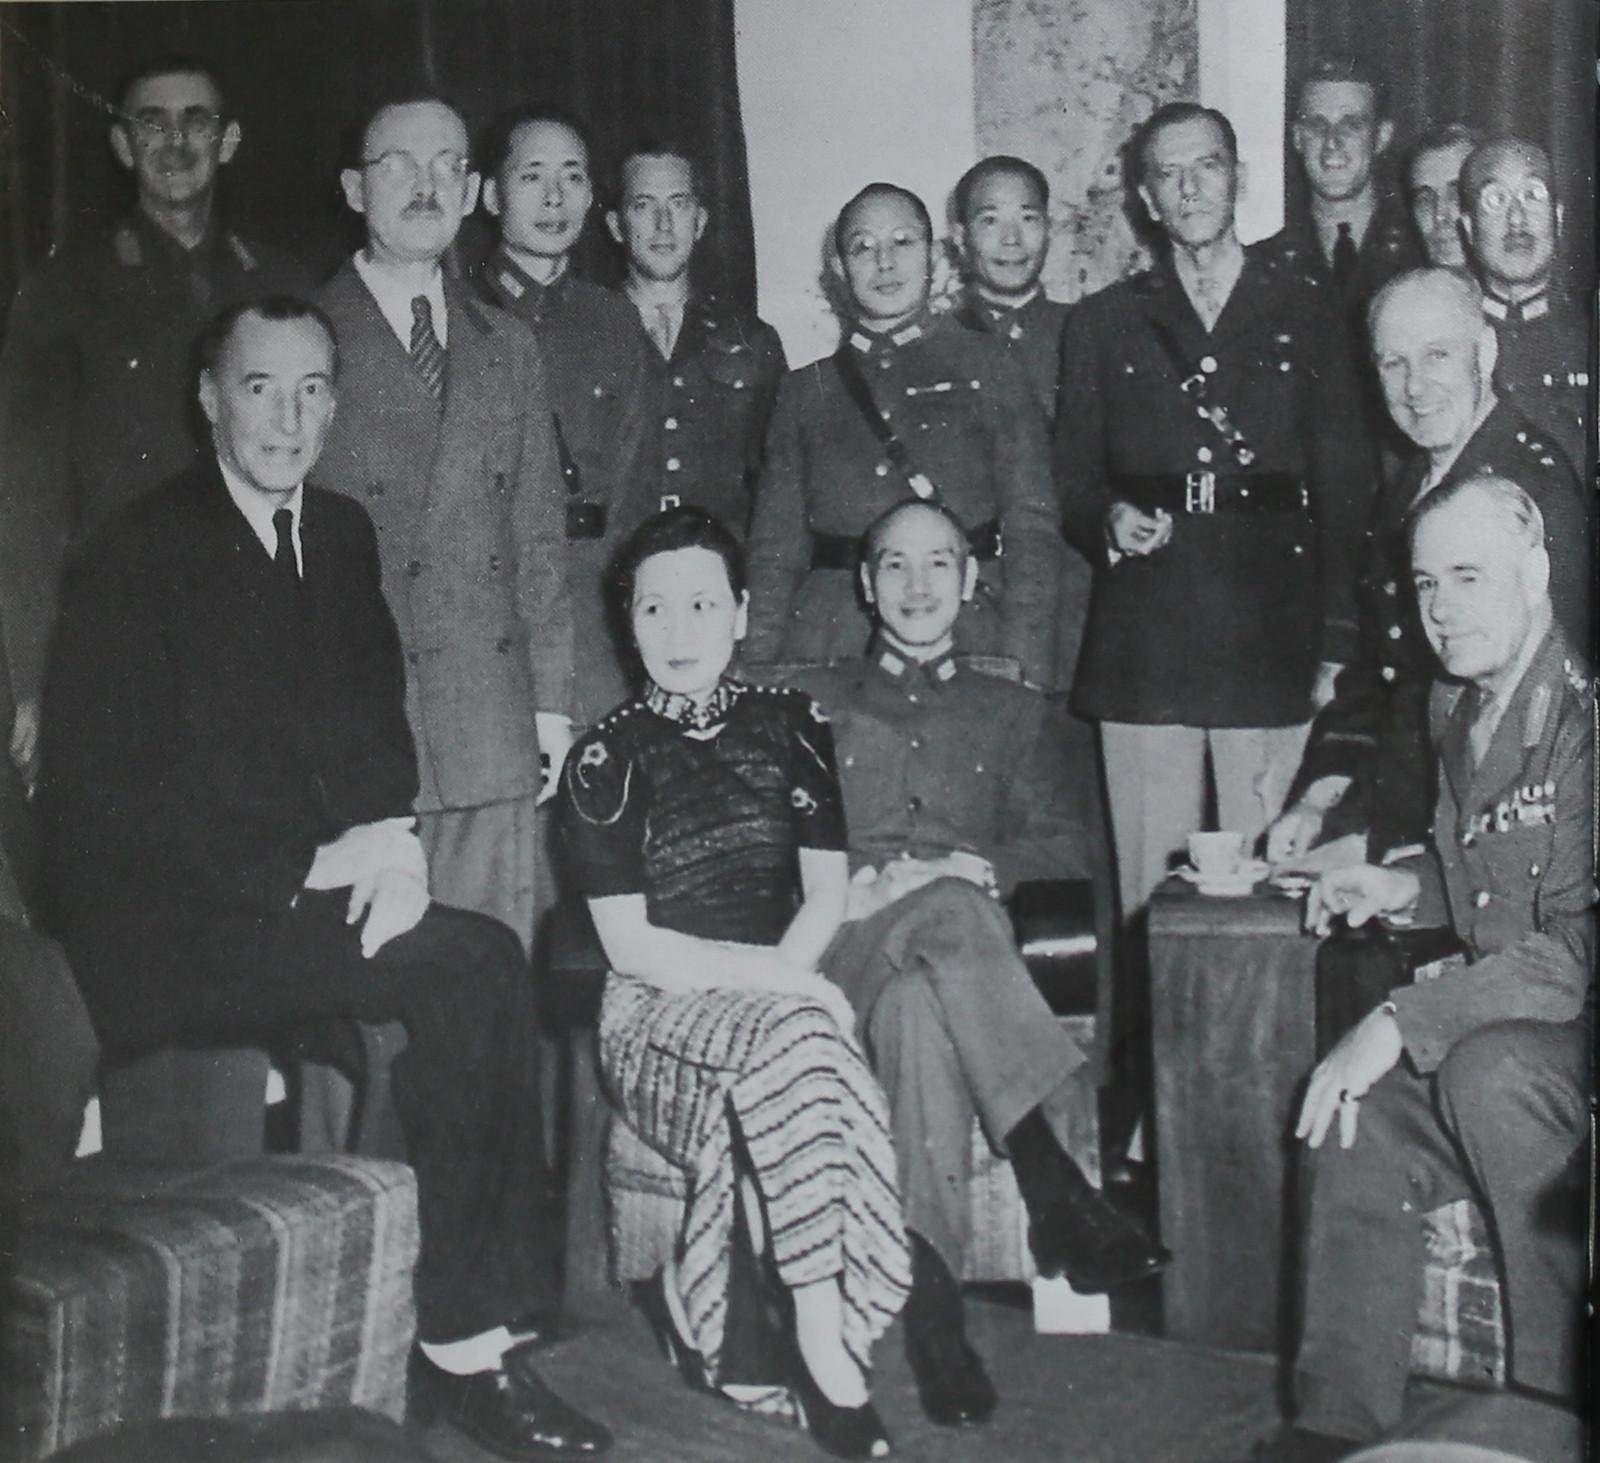 19414p3a0501